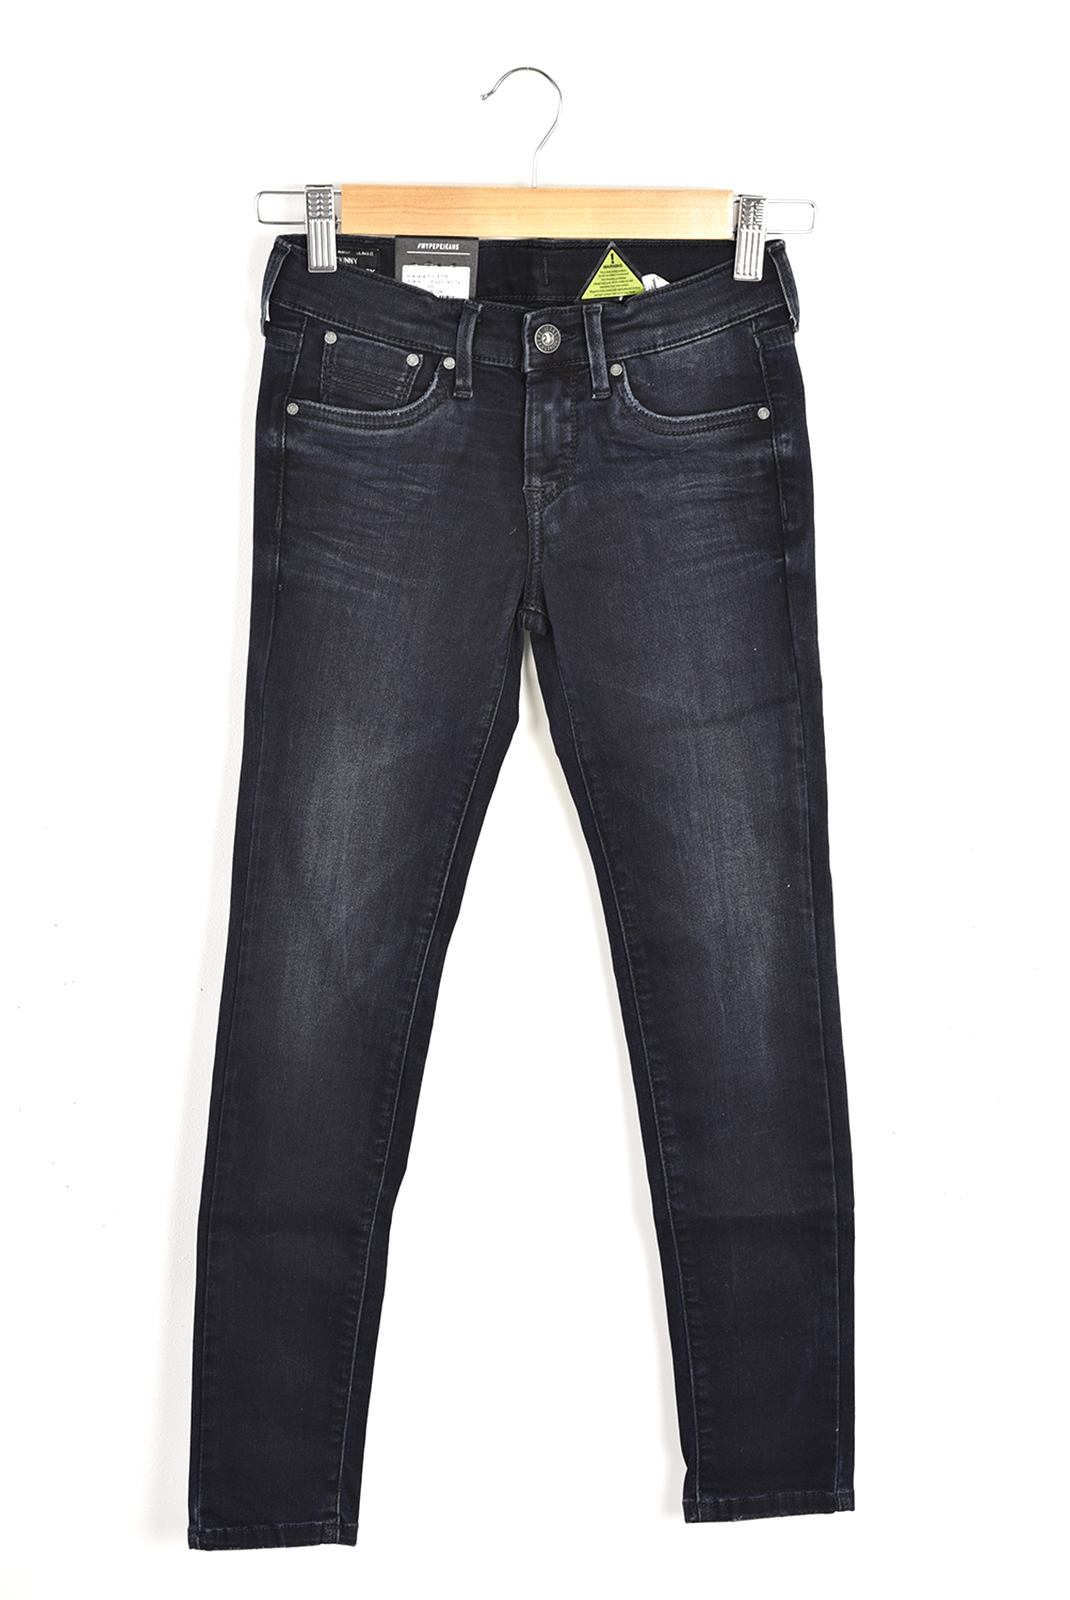 Bas  Pepe jeans PG200242 pixlettte BLEU